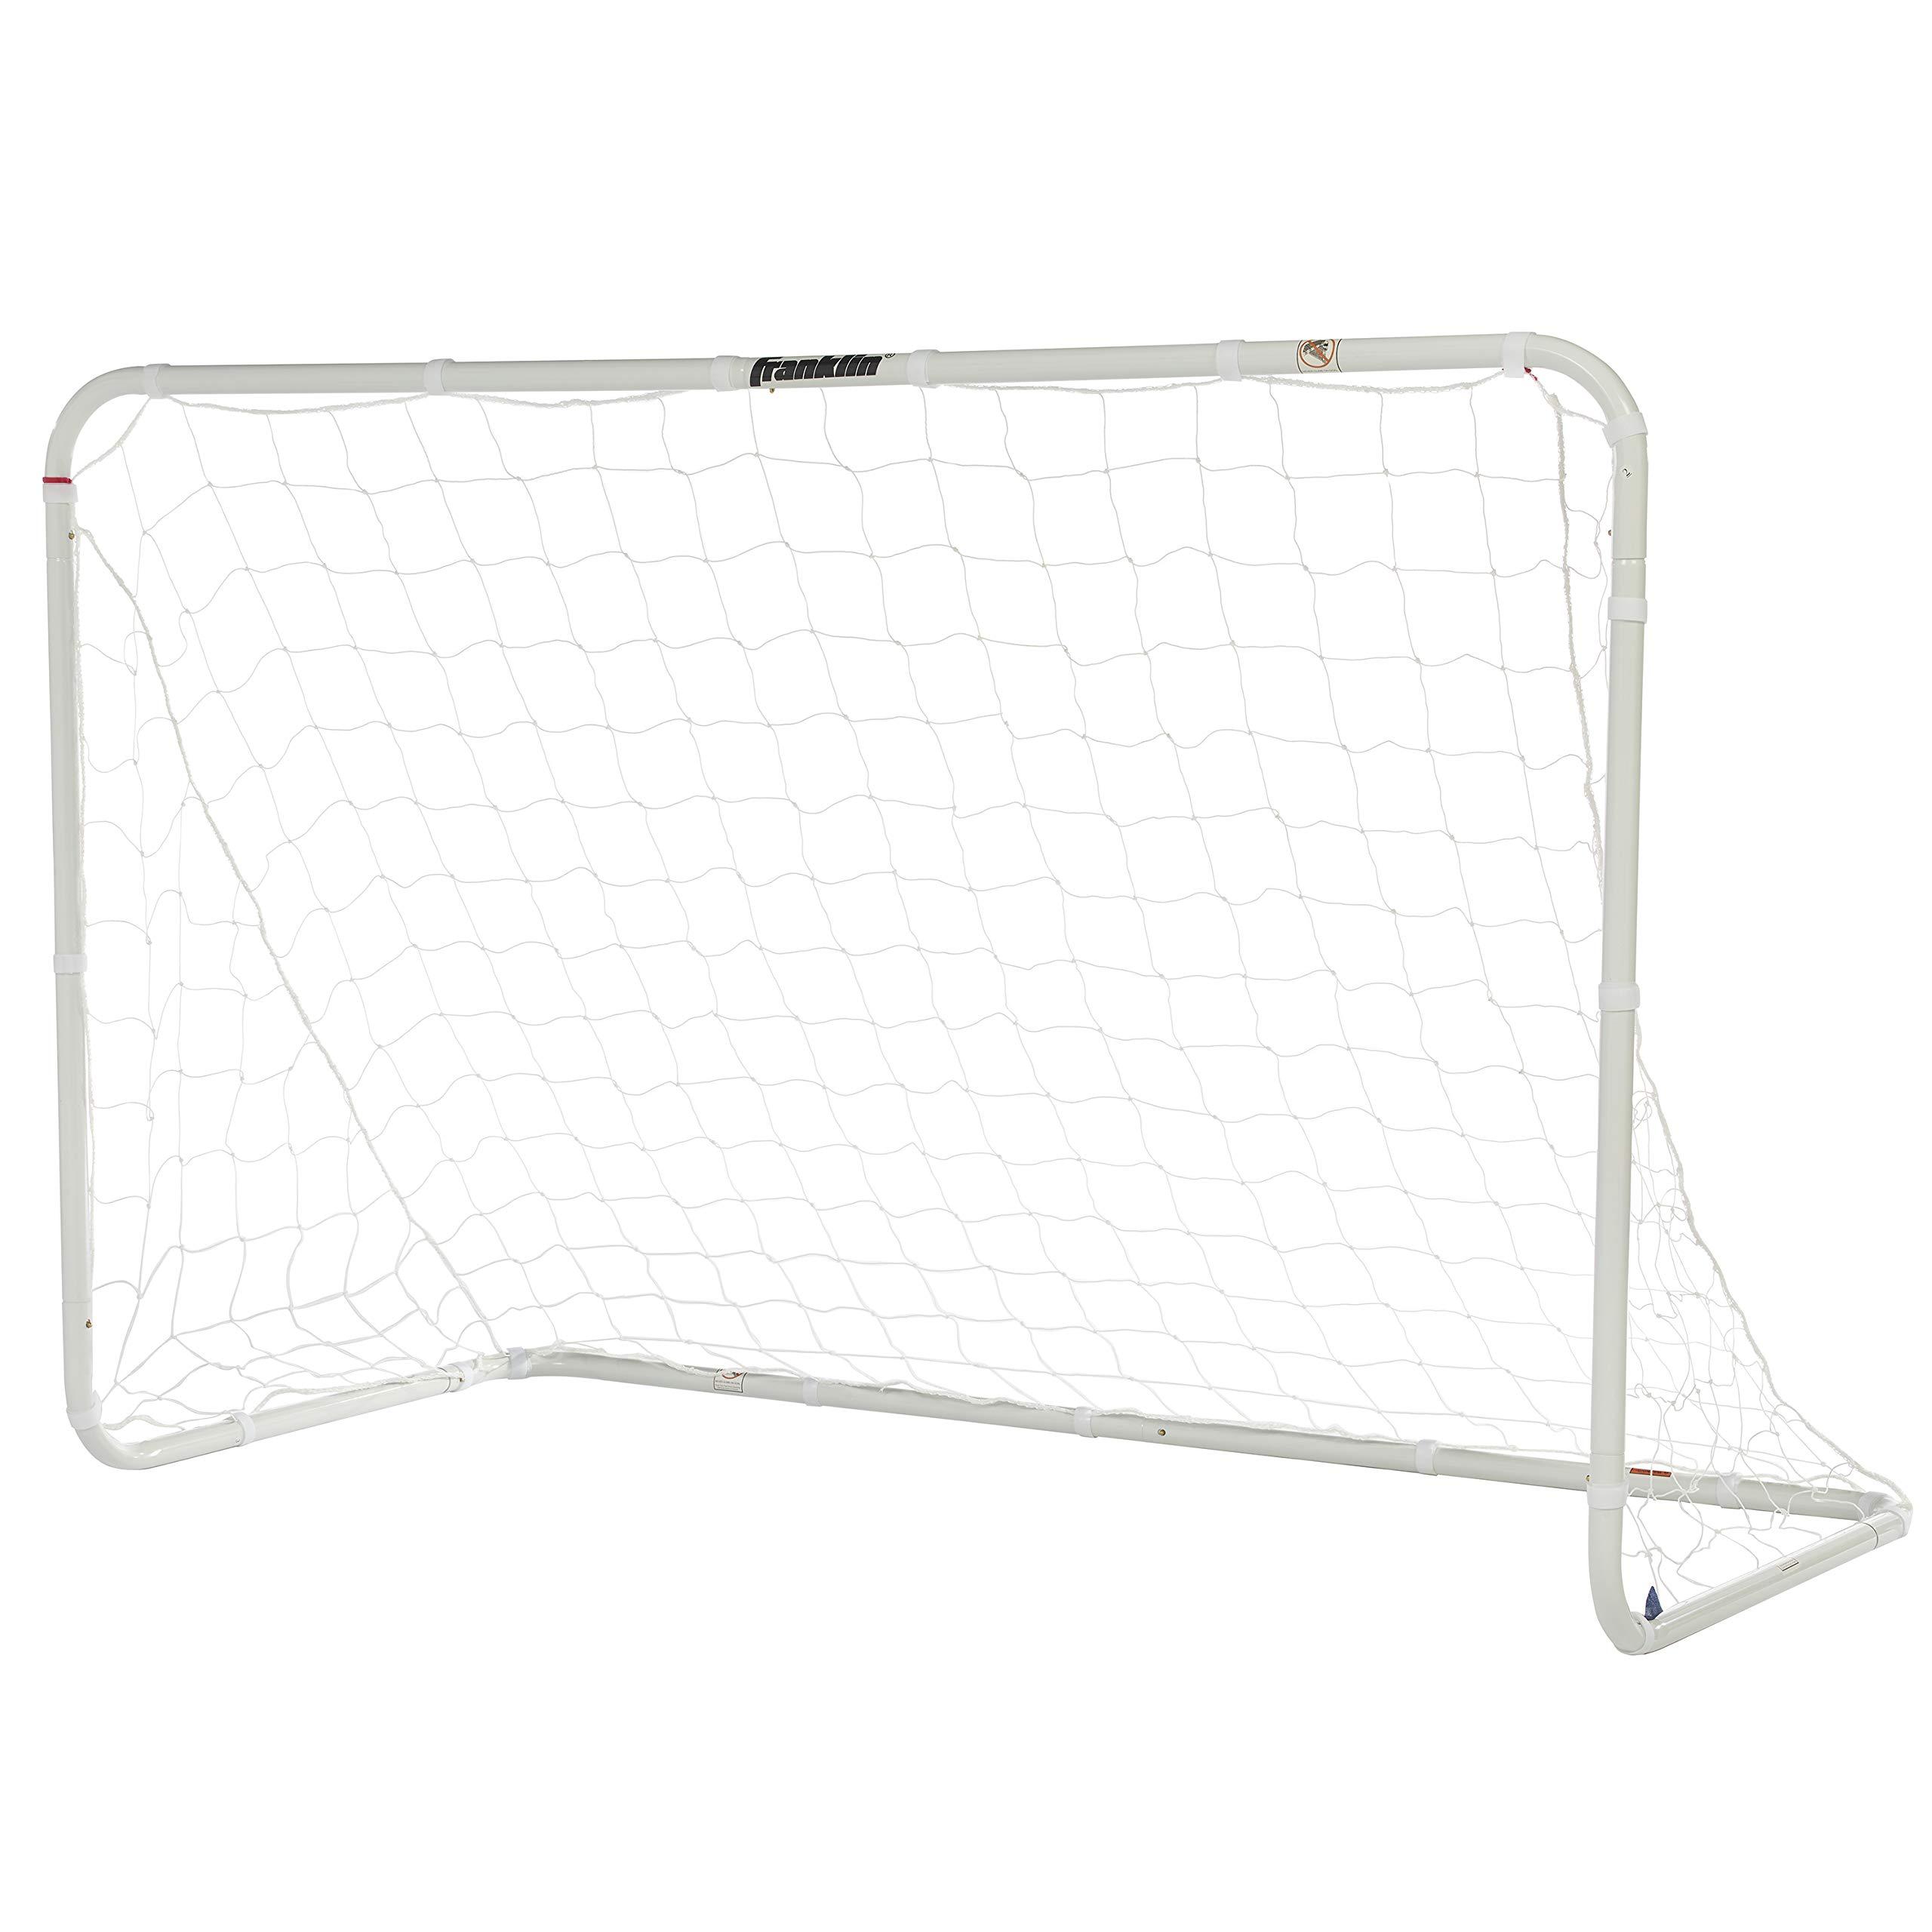 Franklin Sports Competition Soccer Goal – Soccer Net – Soccer Goal for Backyard – Steel Construction – 6 Ft by 4 Ft